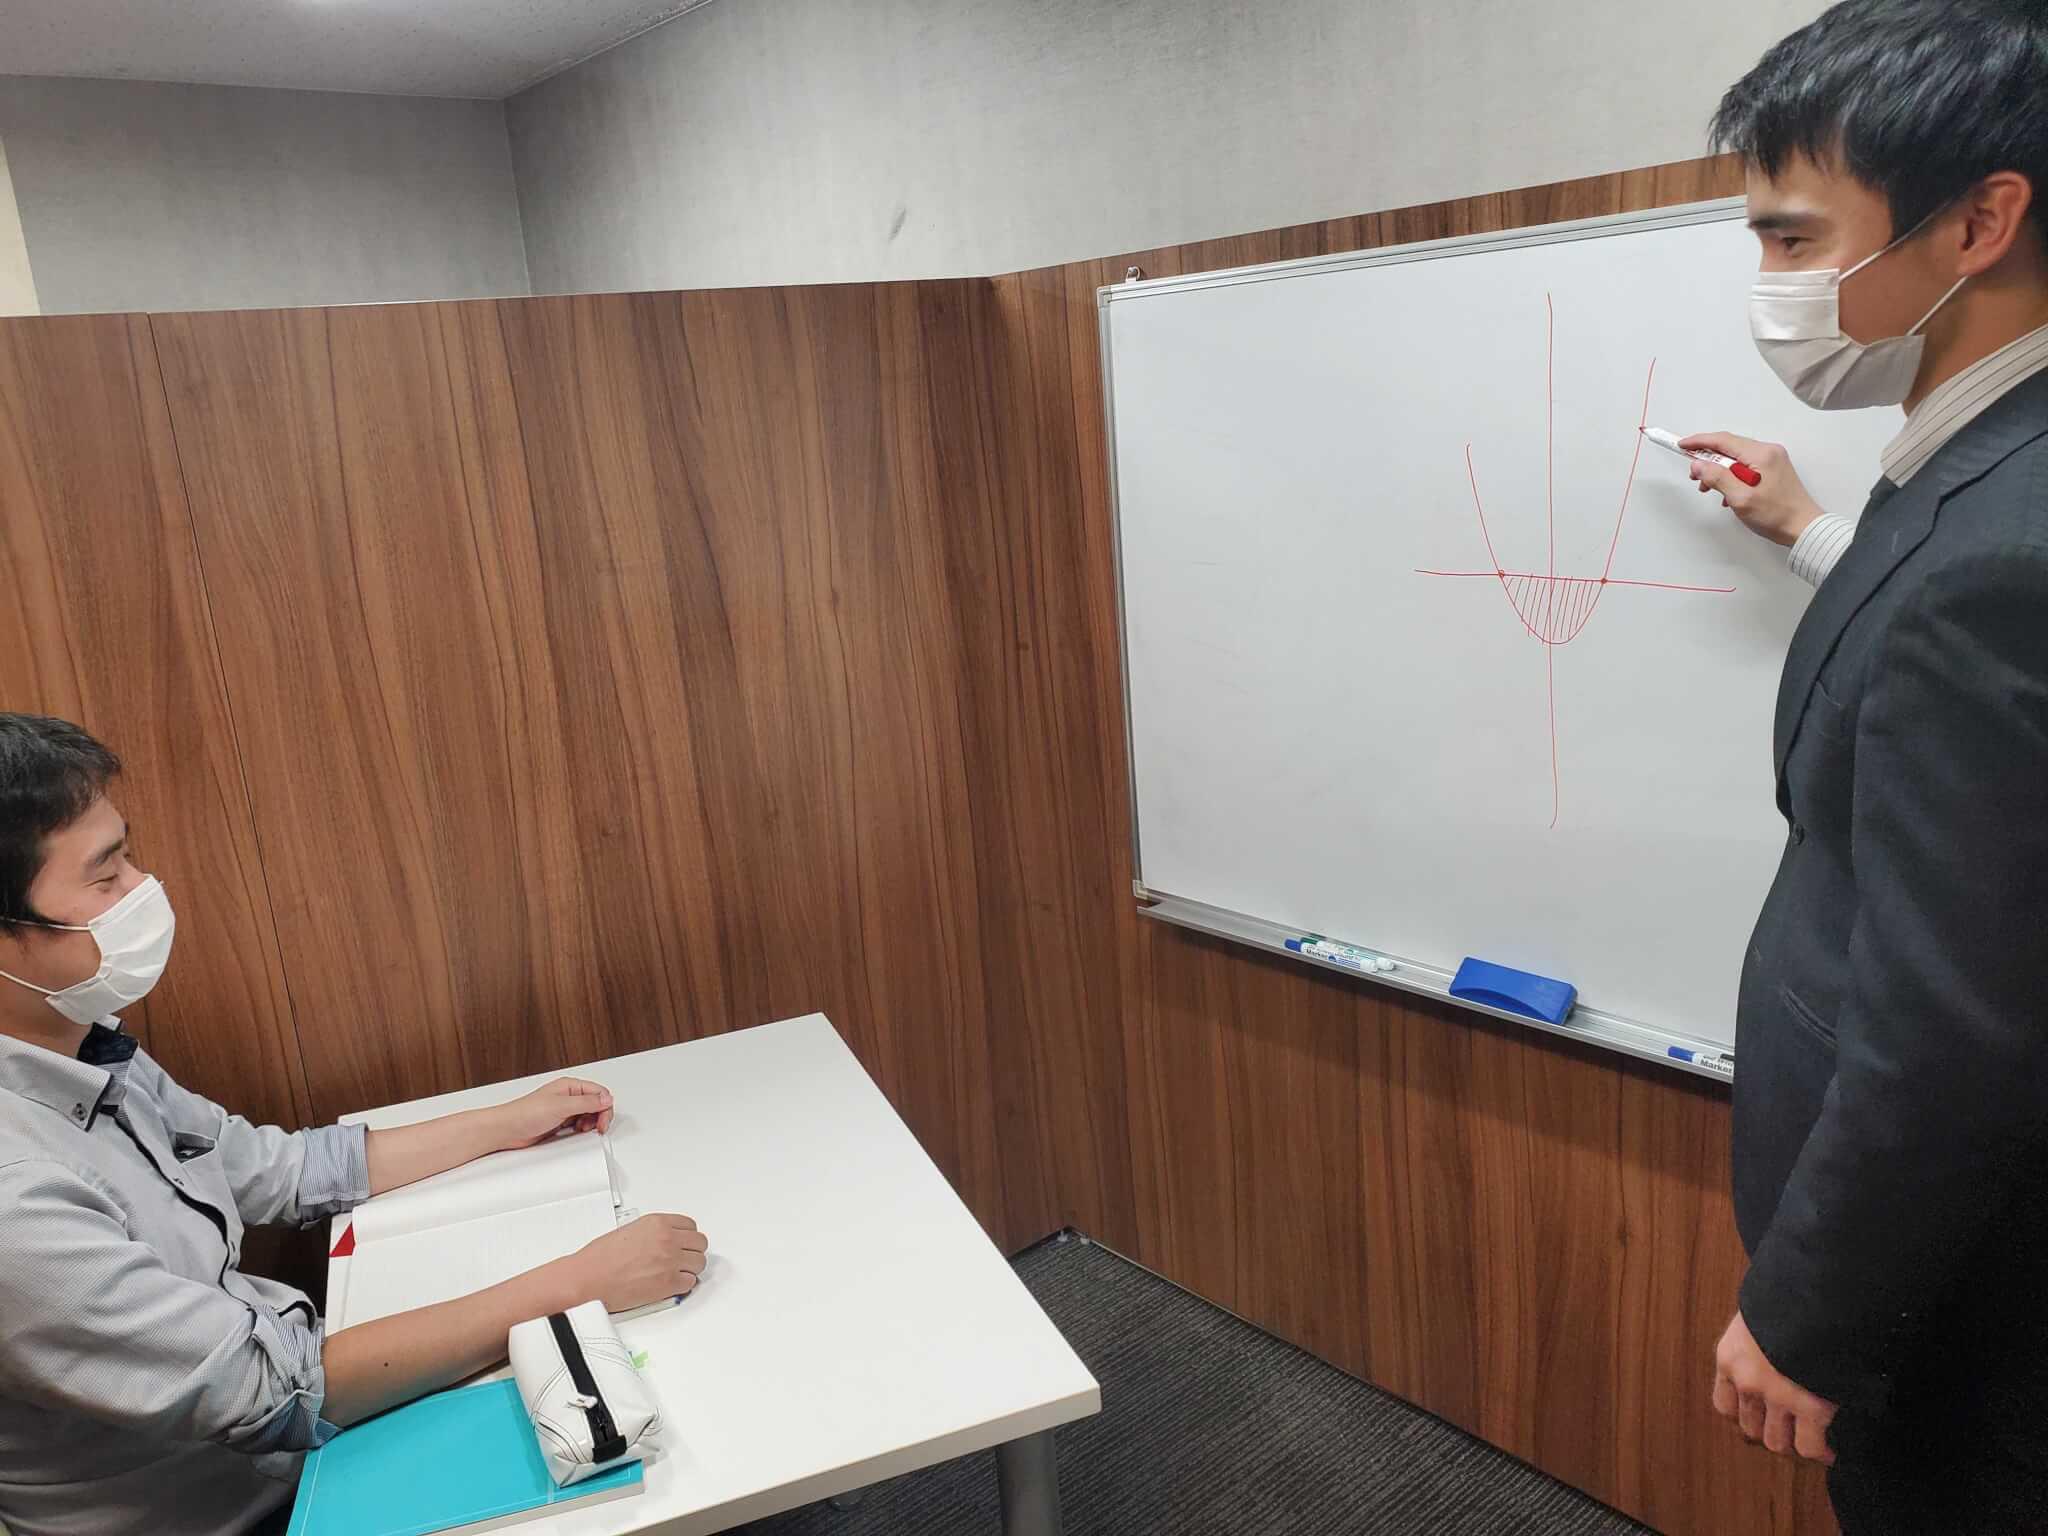 東大生・医学部生の個別指導_2020年度 冬期講習・直前講習 プレアデス